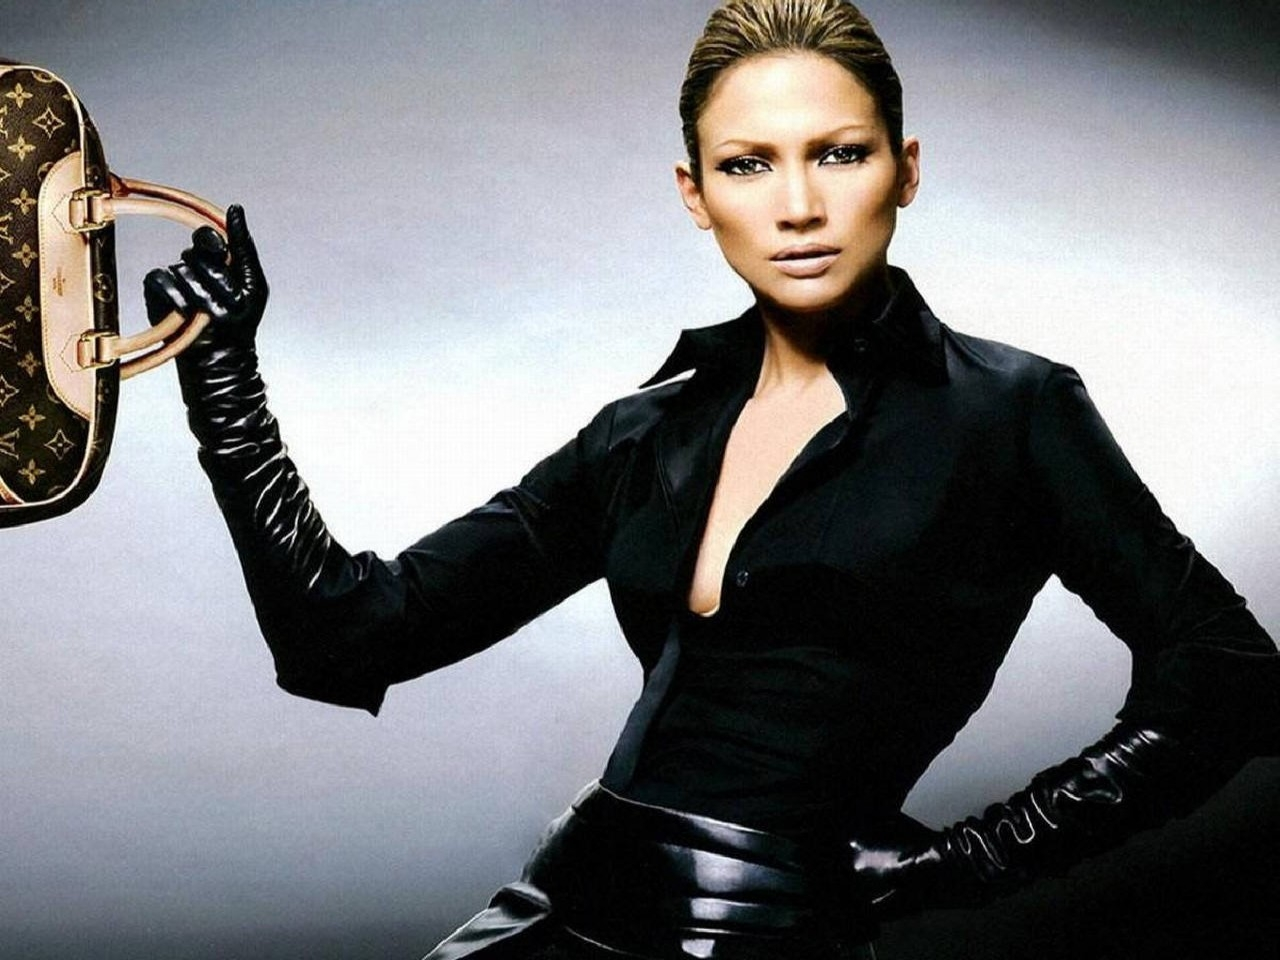 Wallpaper di una seducente Jennifer Lopez